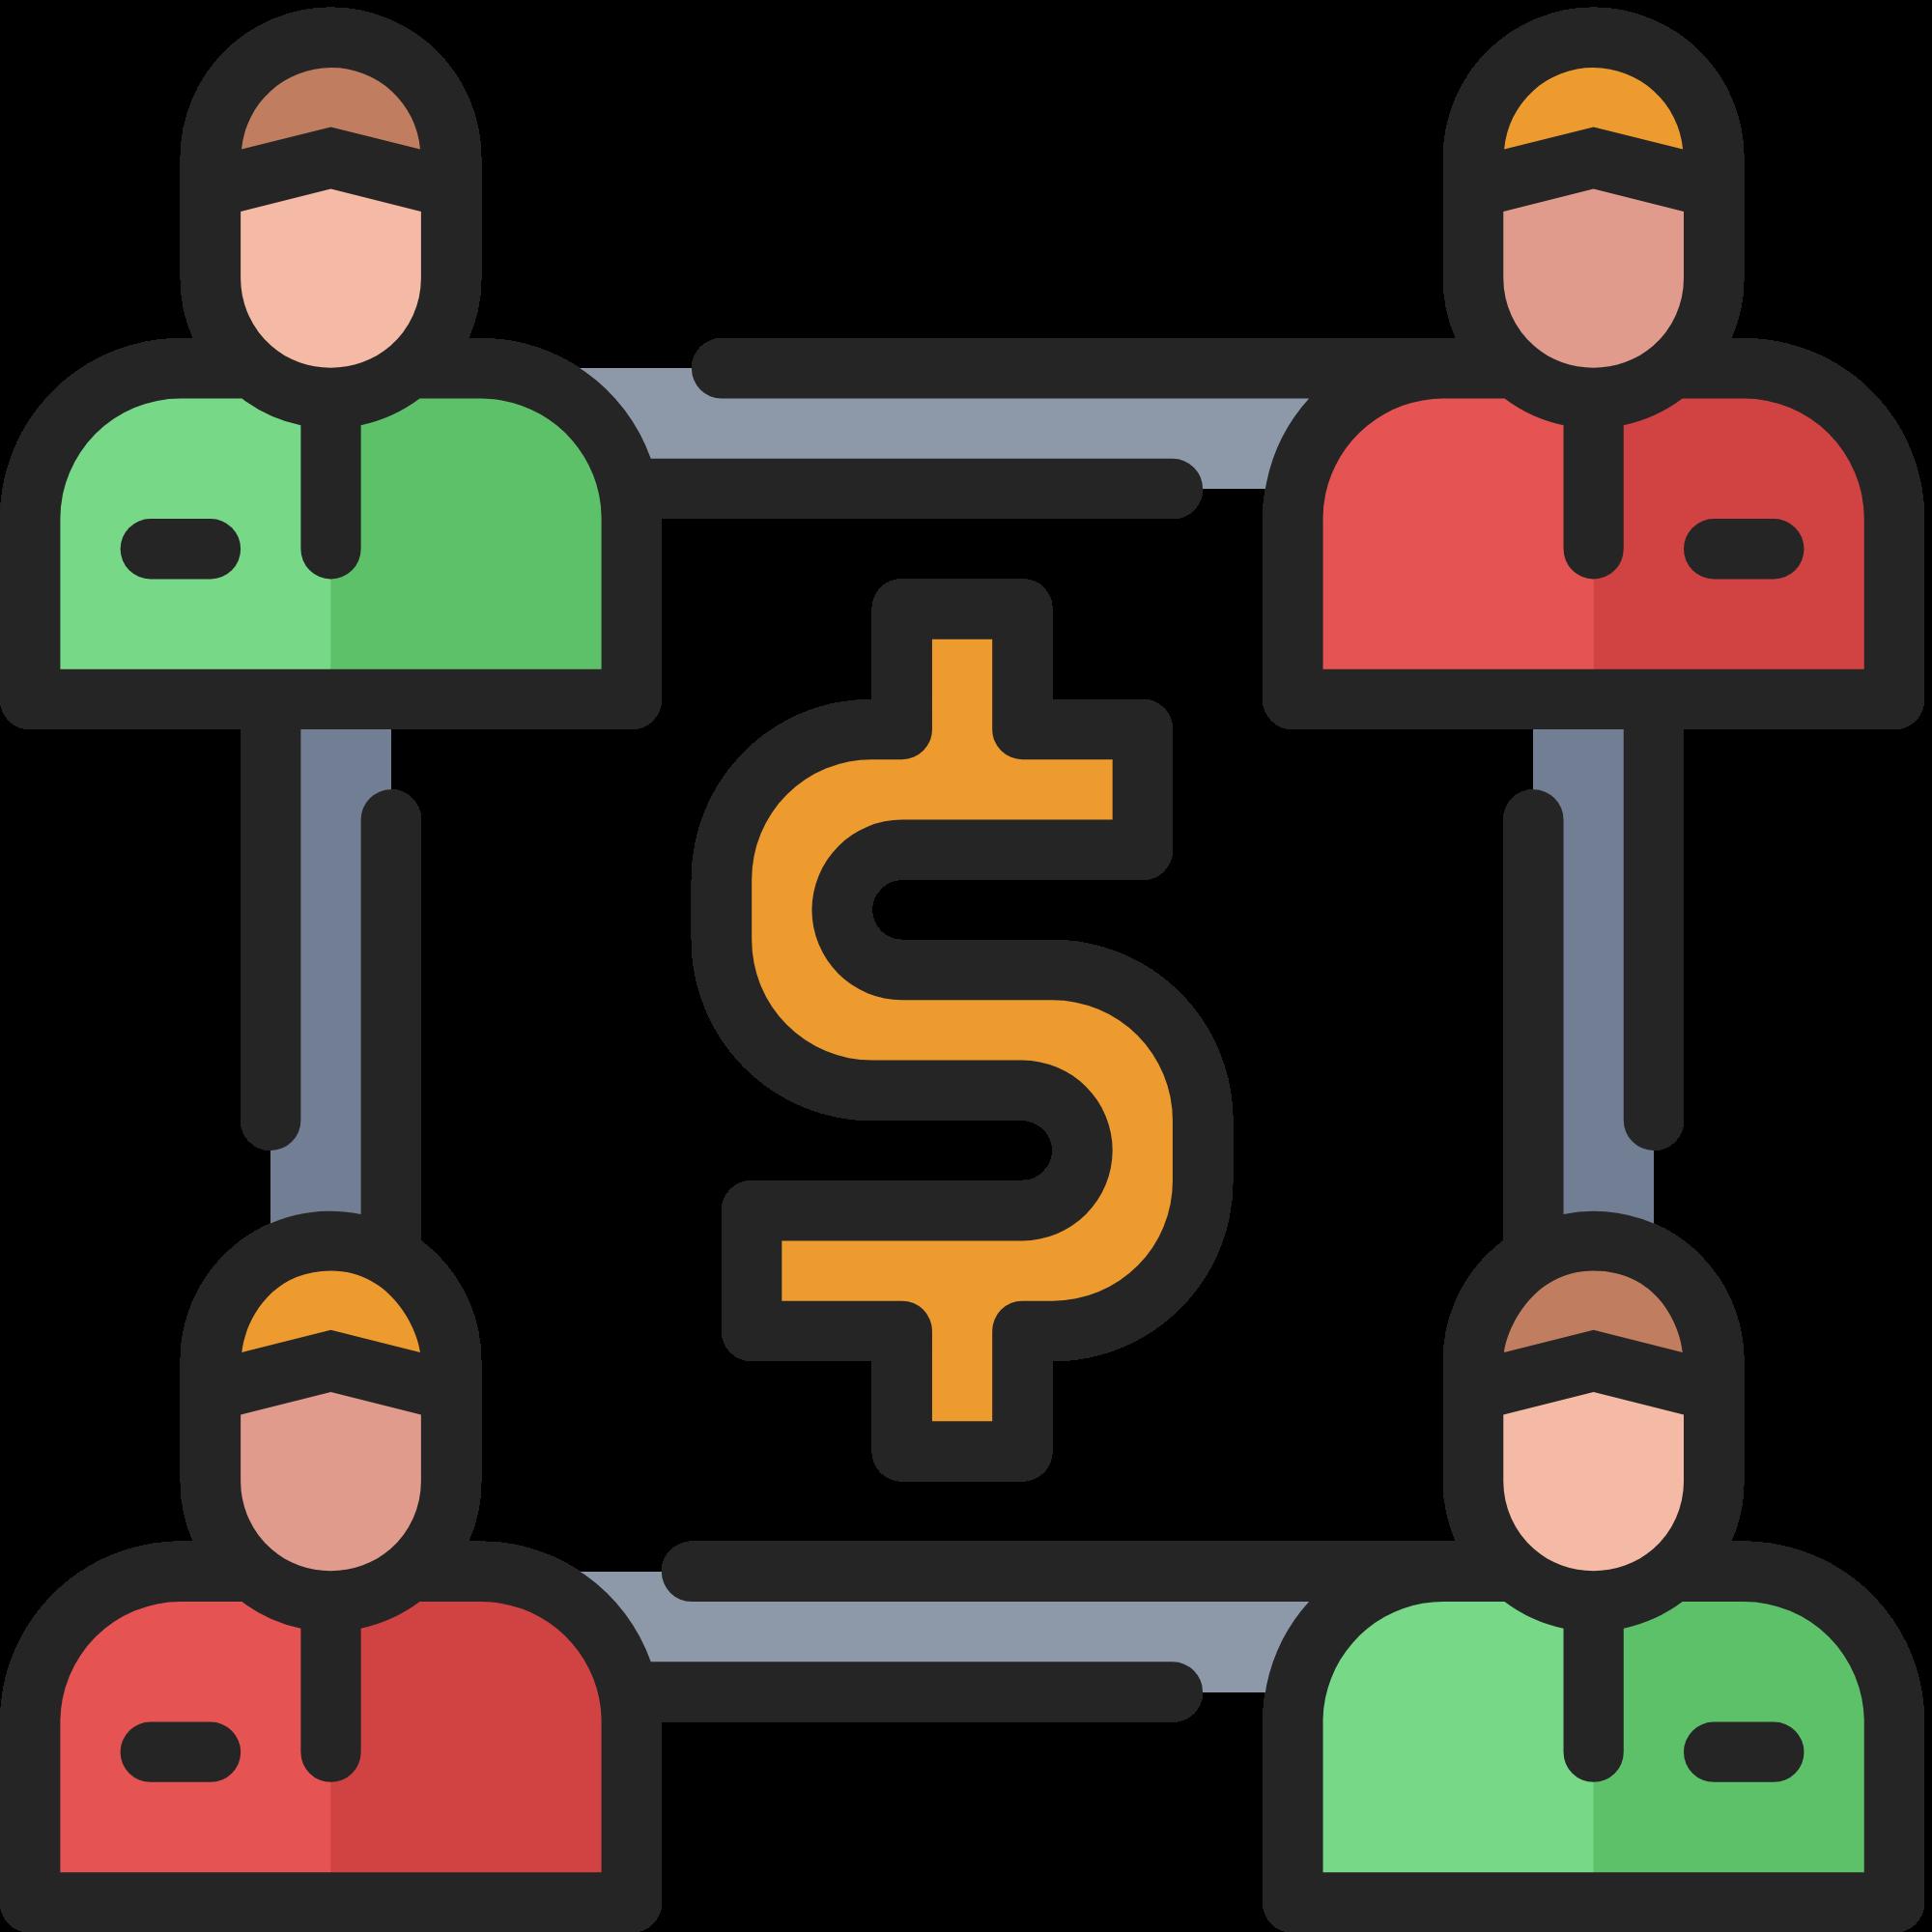 Collaborative economy scheme